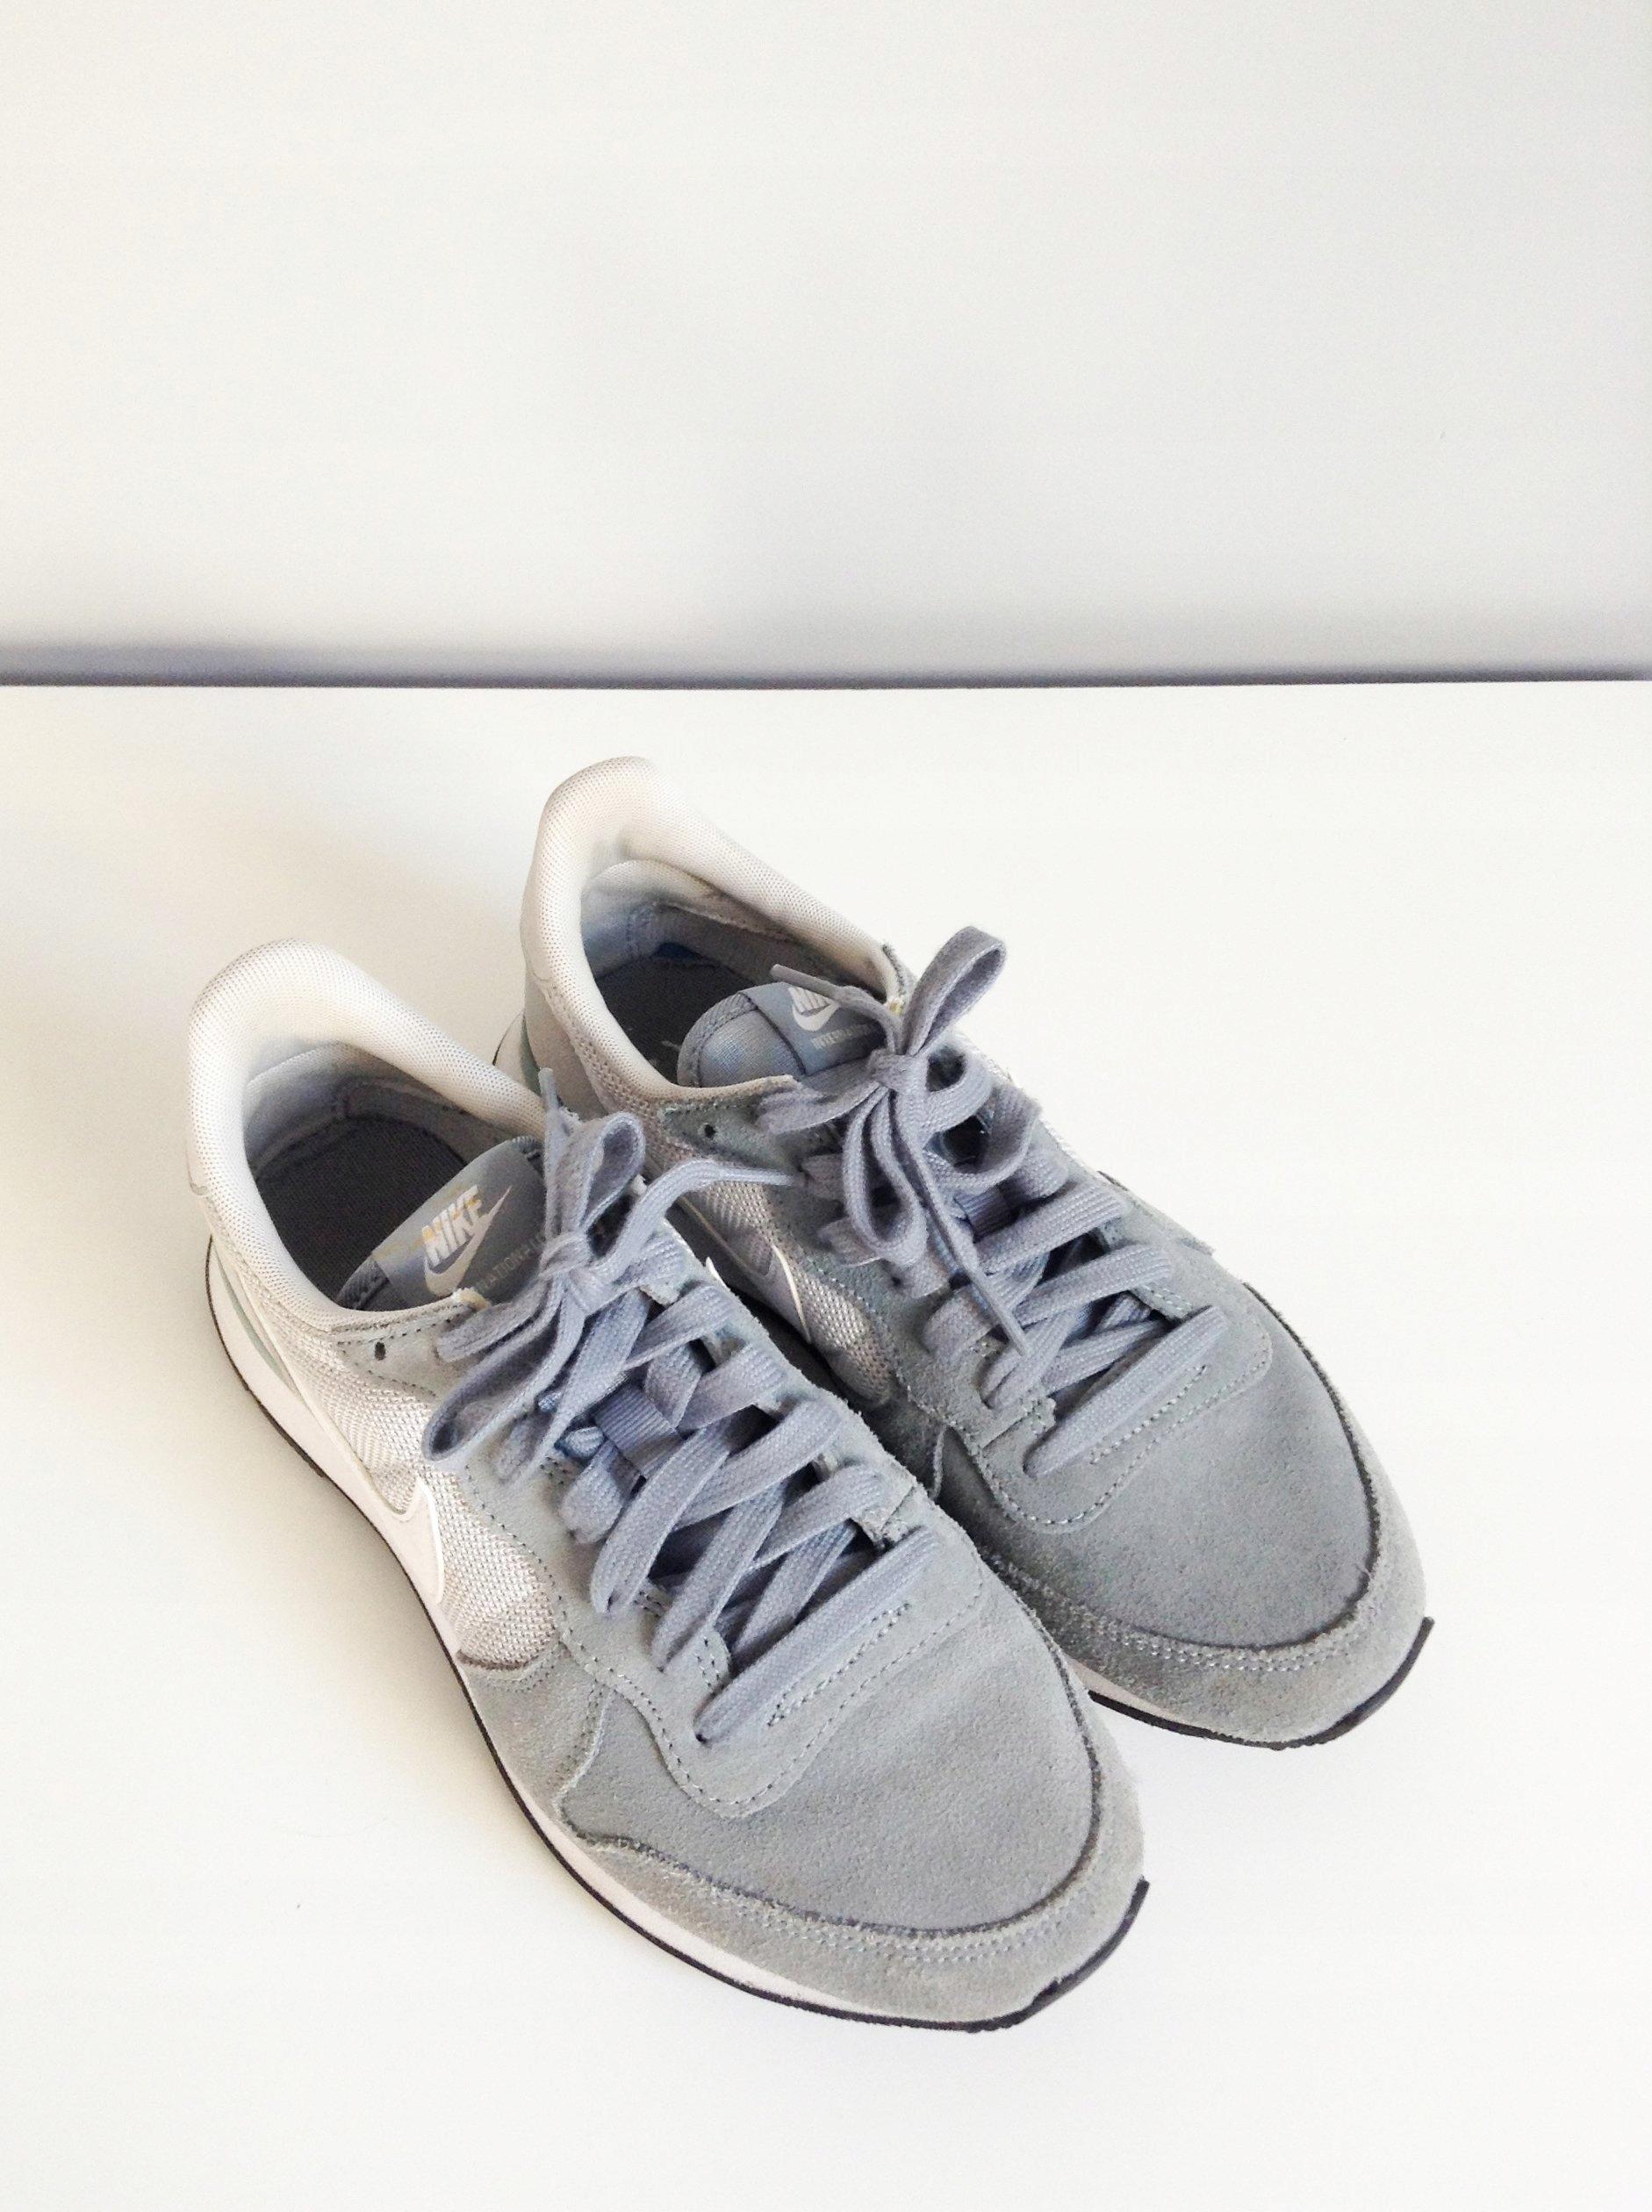 low priced 616a2 0c410 Buty Nike Internationalist Dove Gray 38 ...